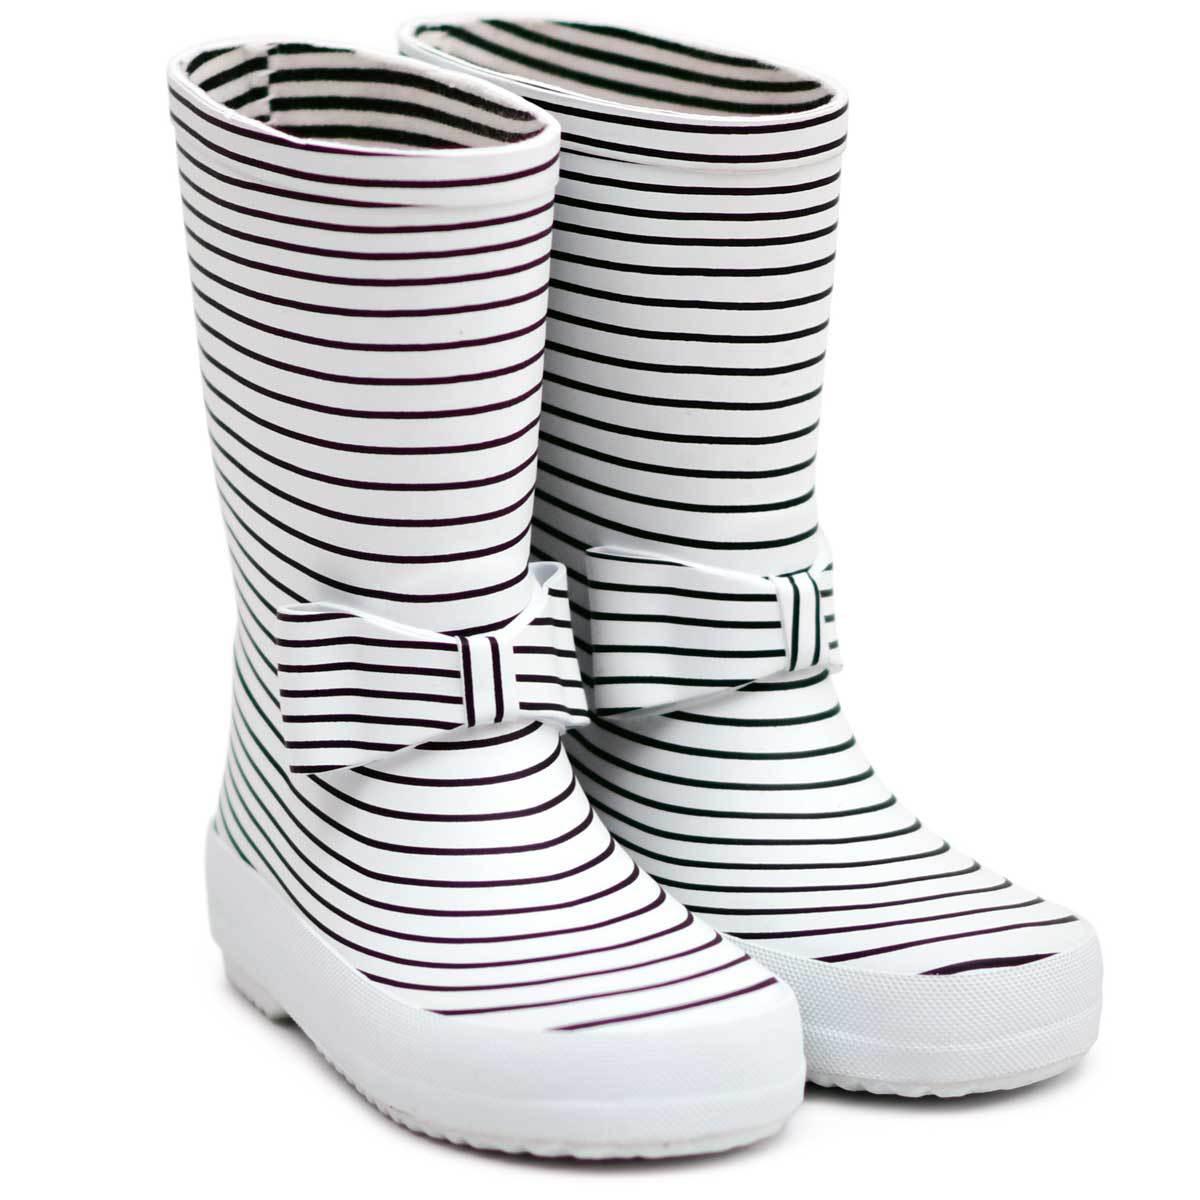 Chaussons & Chaussures Bottes Boxbonaute Bowtie - 22 Bottes Boxbonaute Bowtie - 22